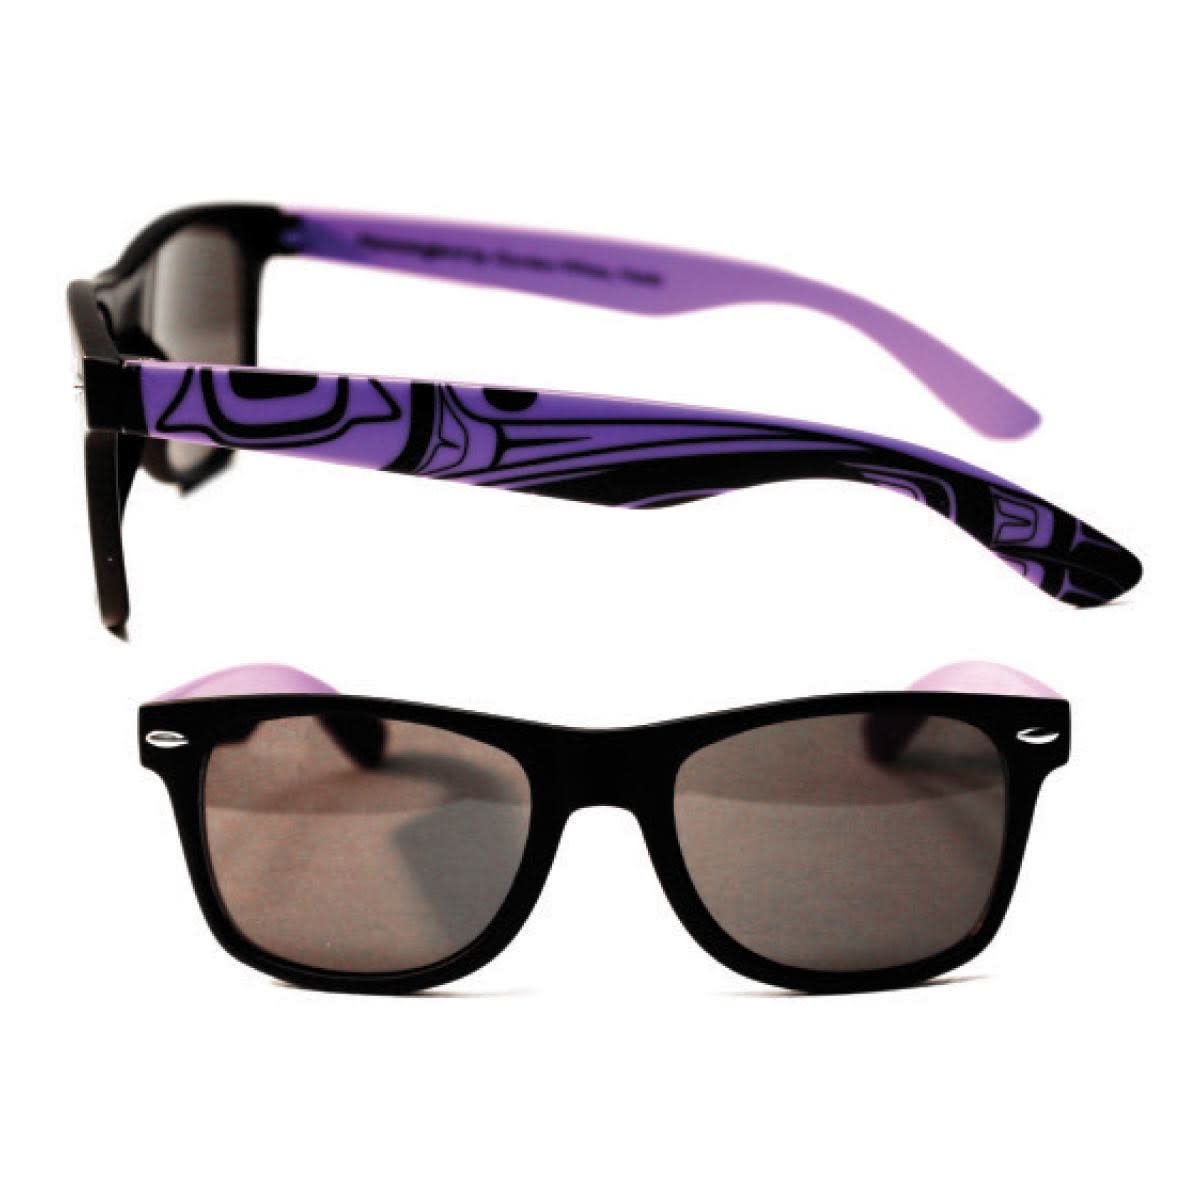 SunGlasses - Adult-4